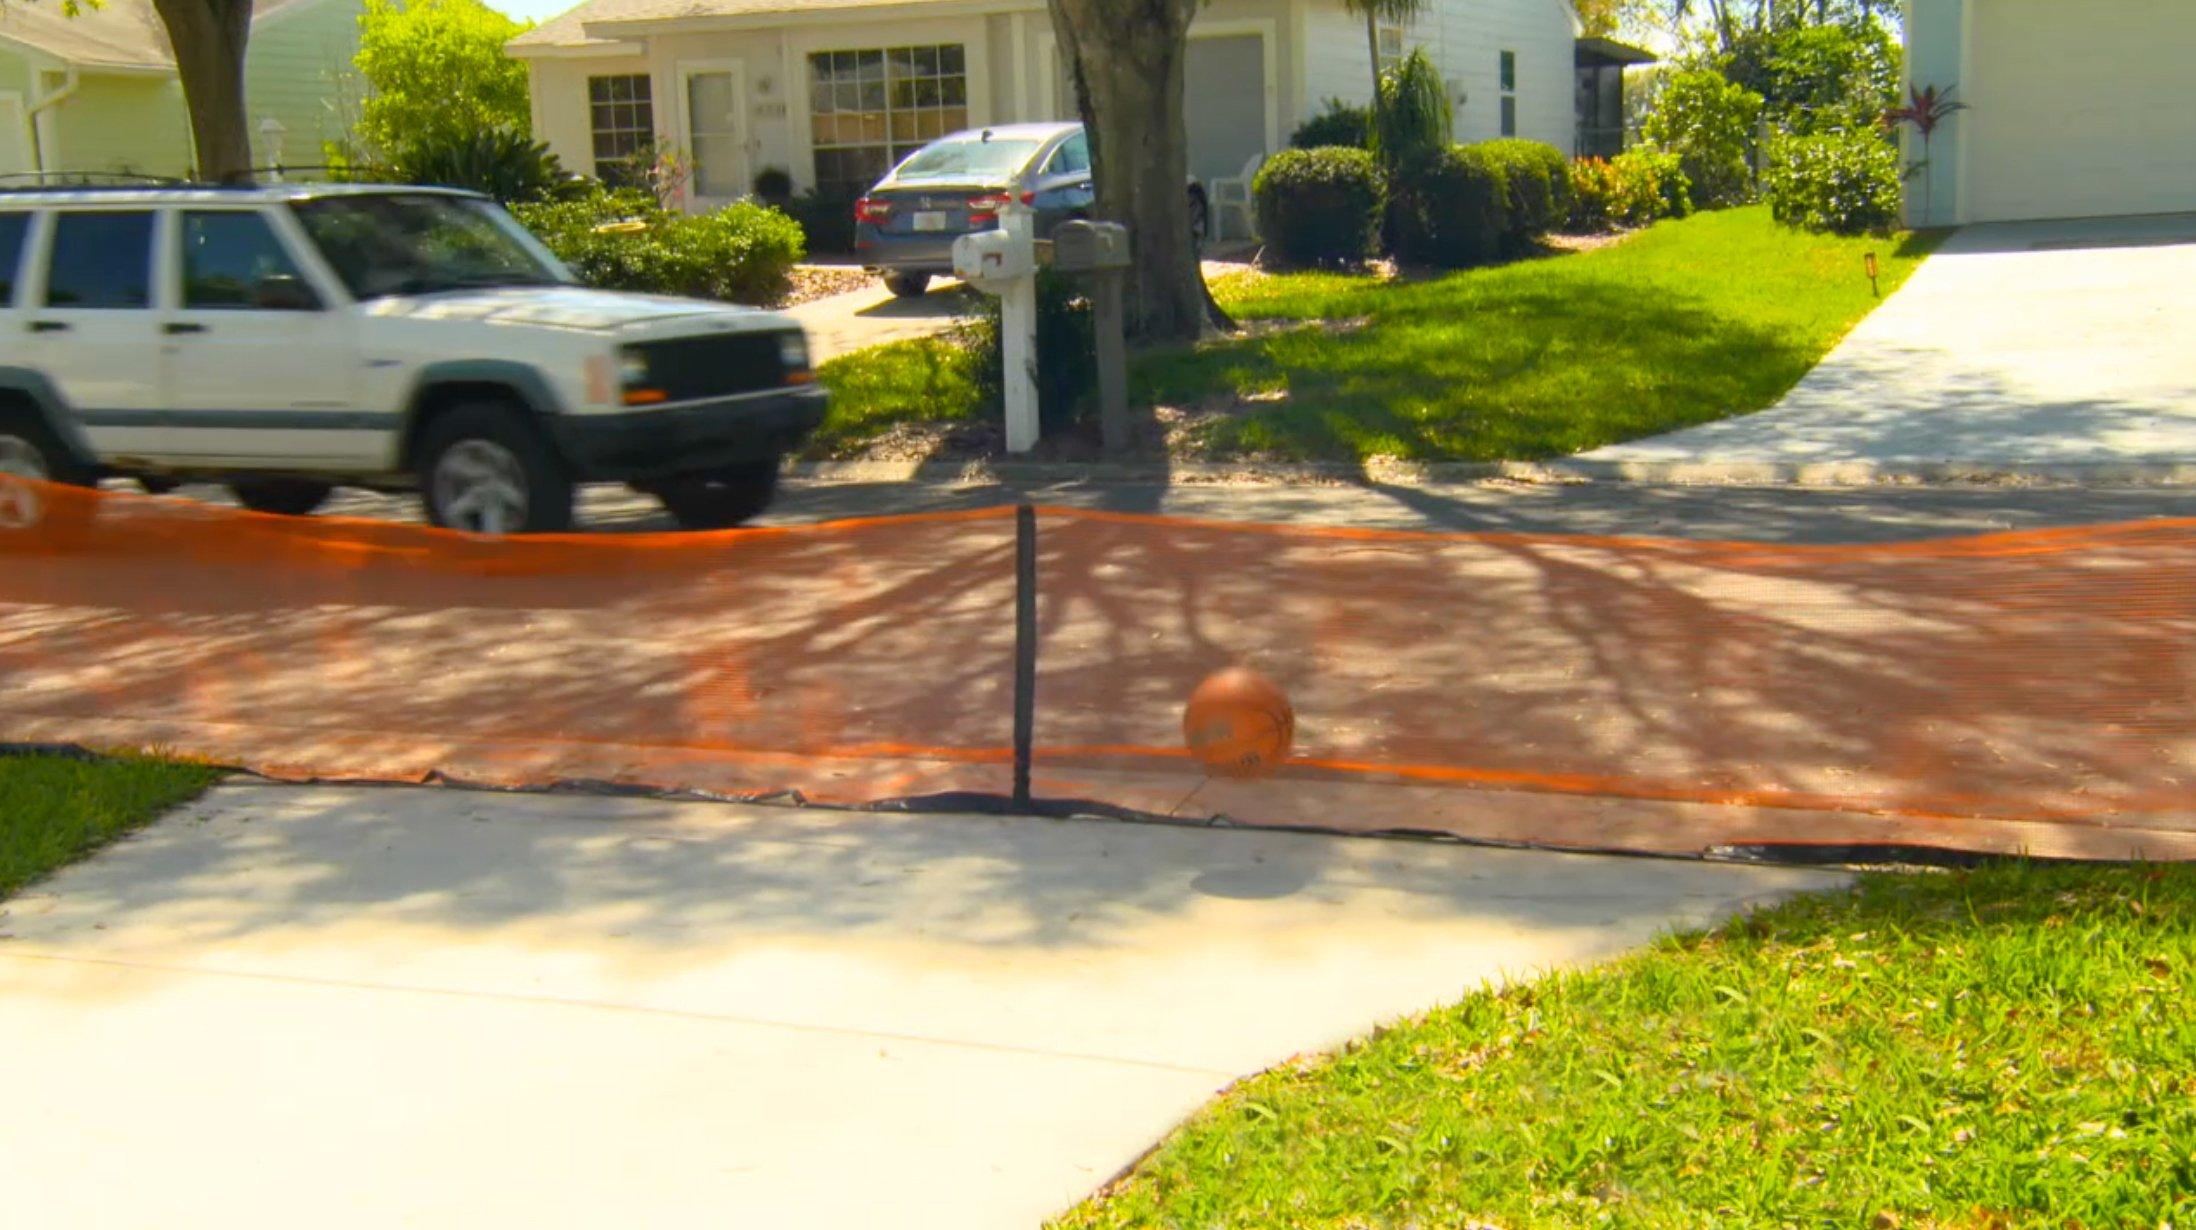 Play It Safe RPDN26 Driveway Net, Large, Orange by Play It Safe (Image #2)